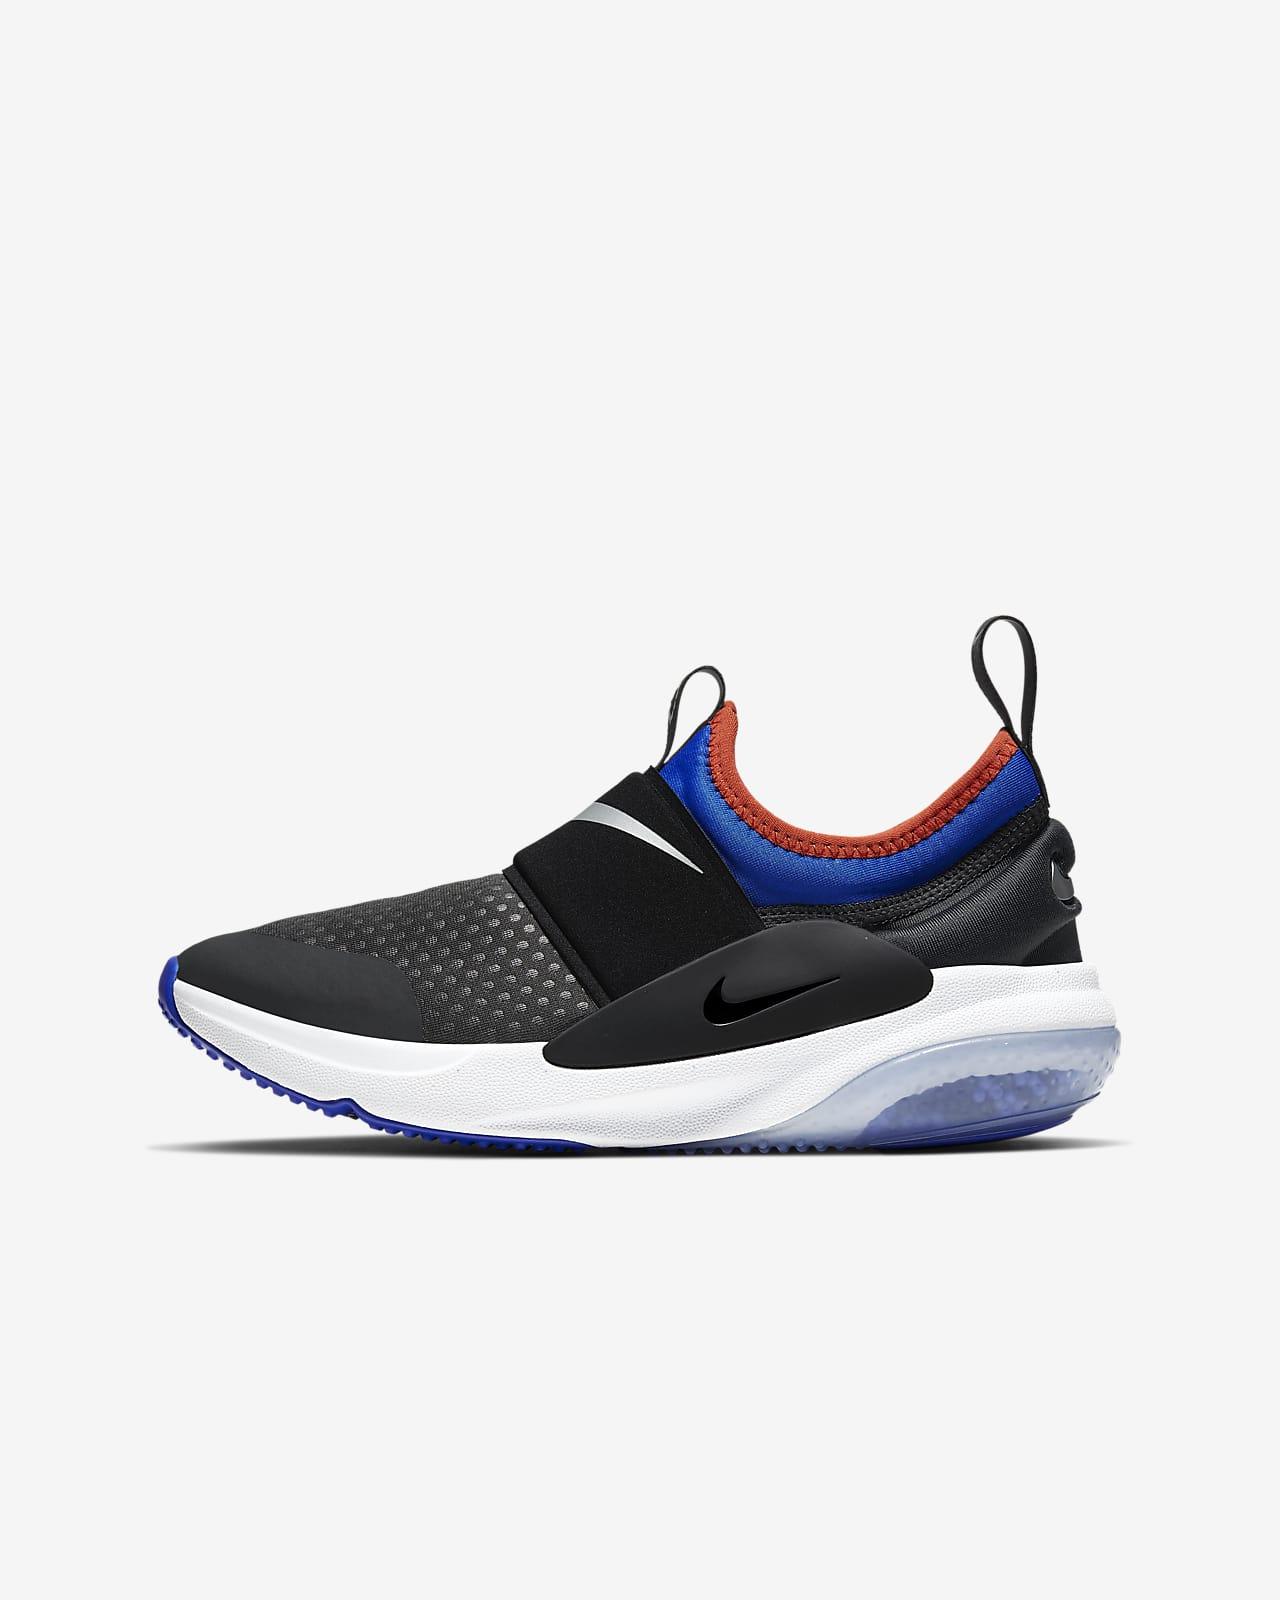 Calzado para niños talla pequeña/grande Nike Joyride Nova